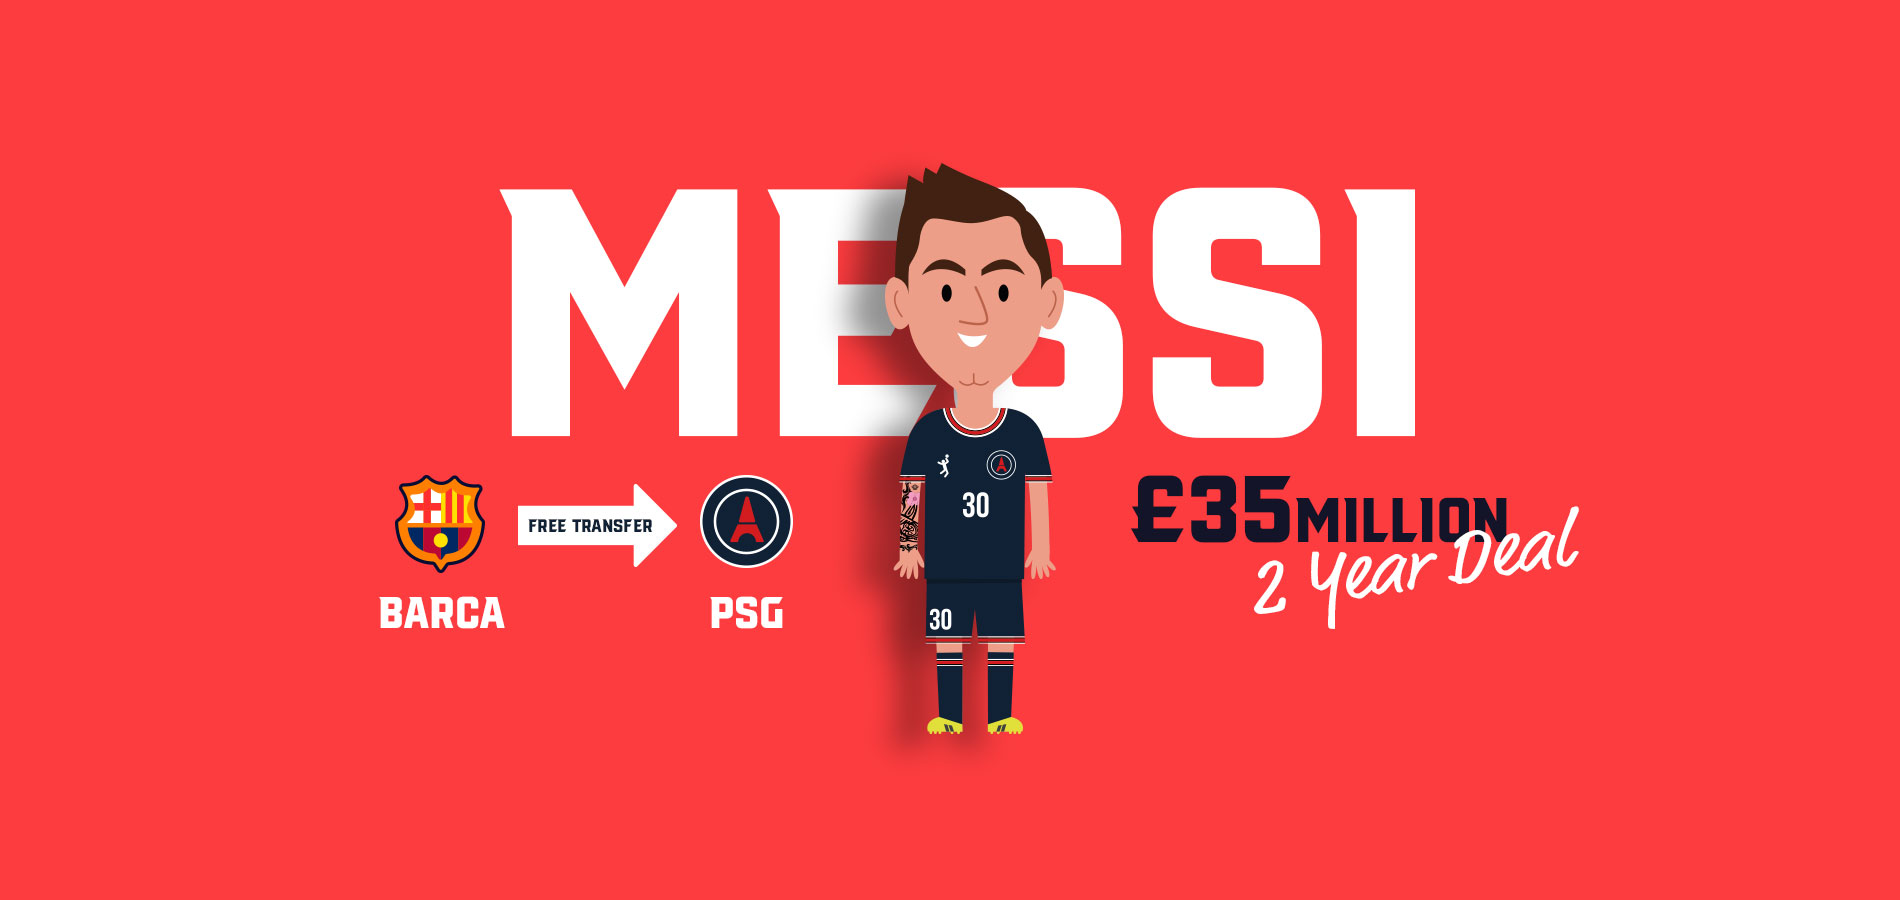 Lionel Messi transfer news - FC Barcelona to PSG